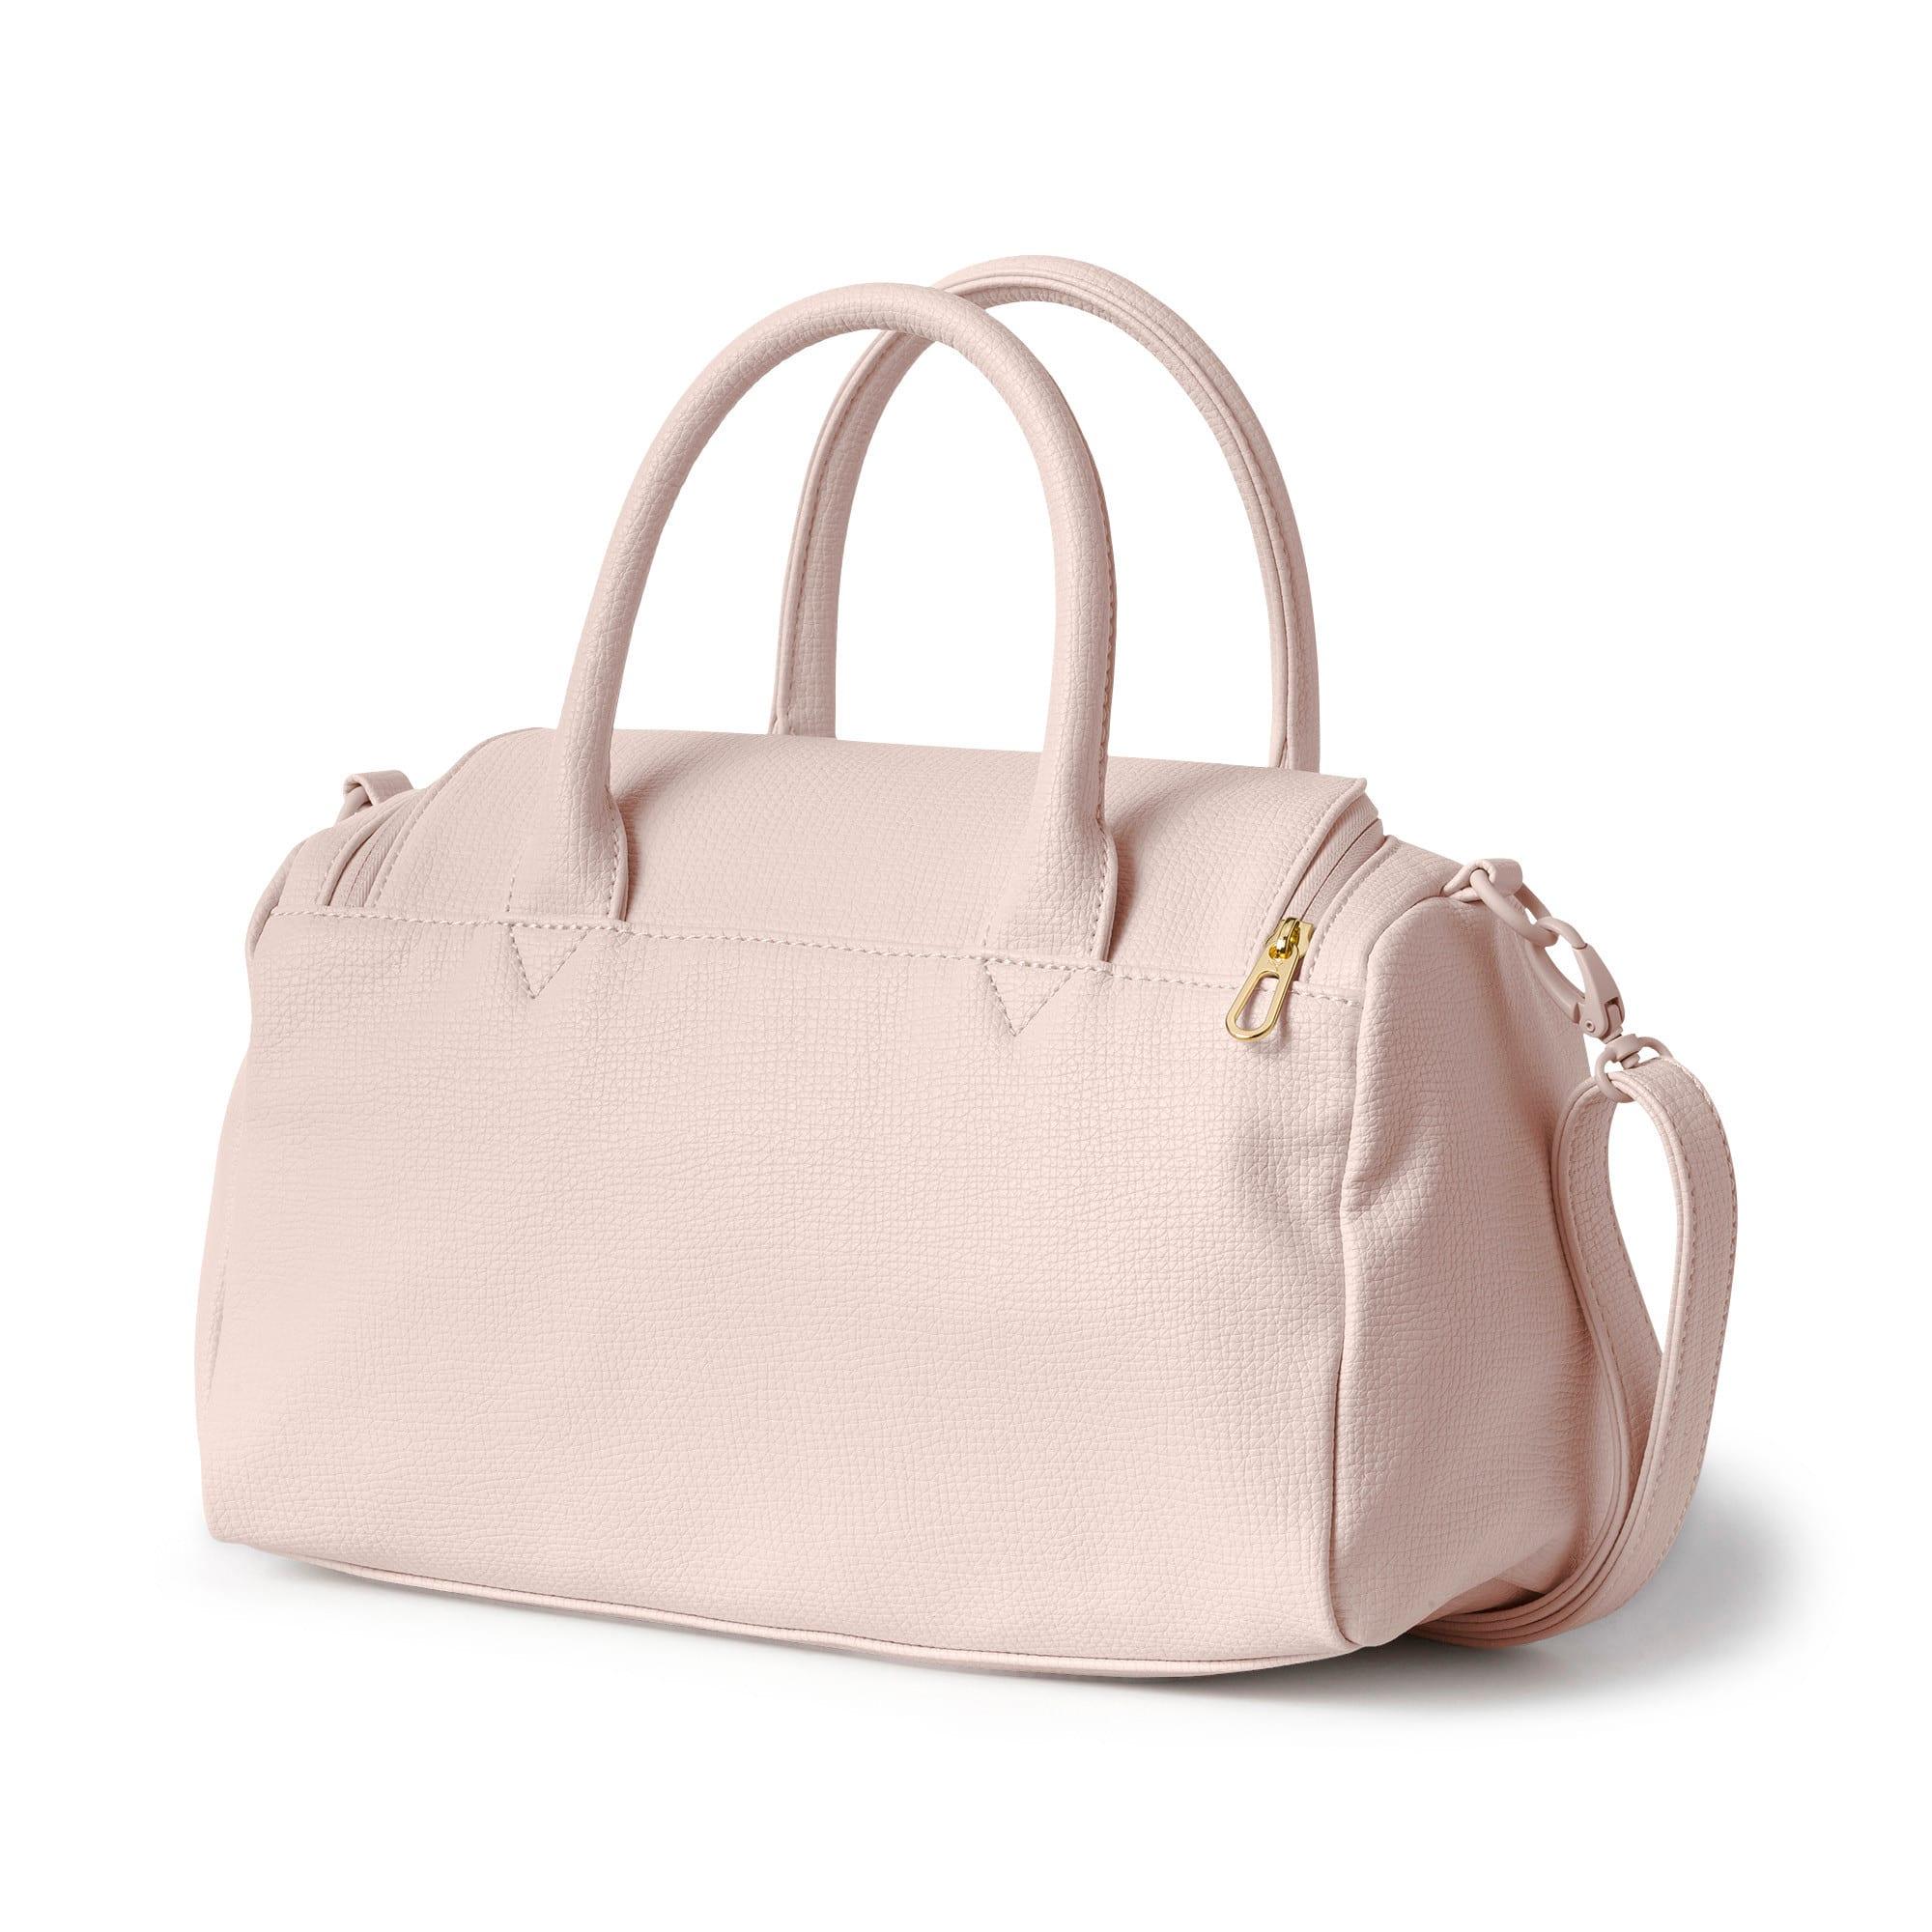 Thumbnail 3 of Ferrari Lifestyle Women's Handbag, Pastel Parchment, medium-IND